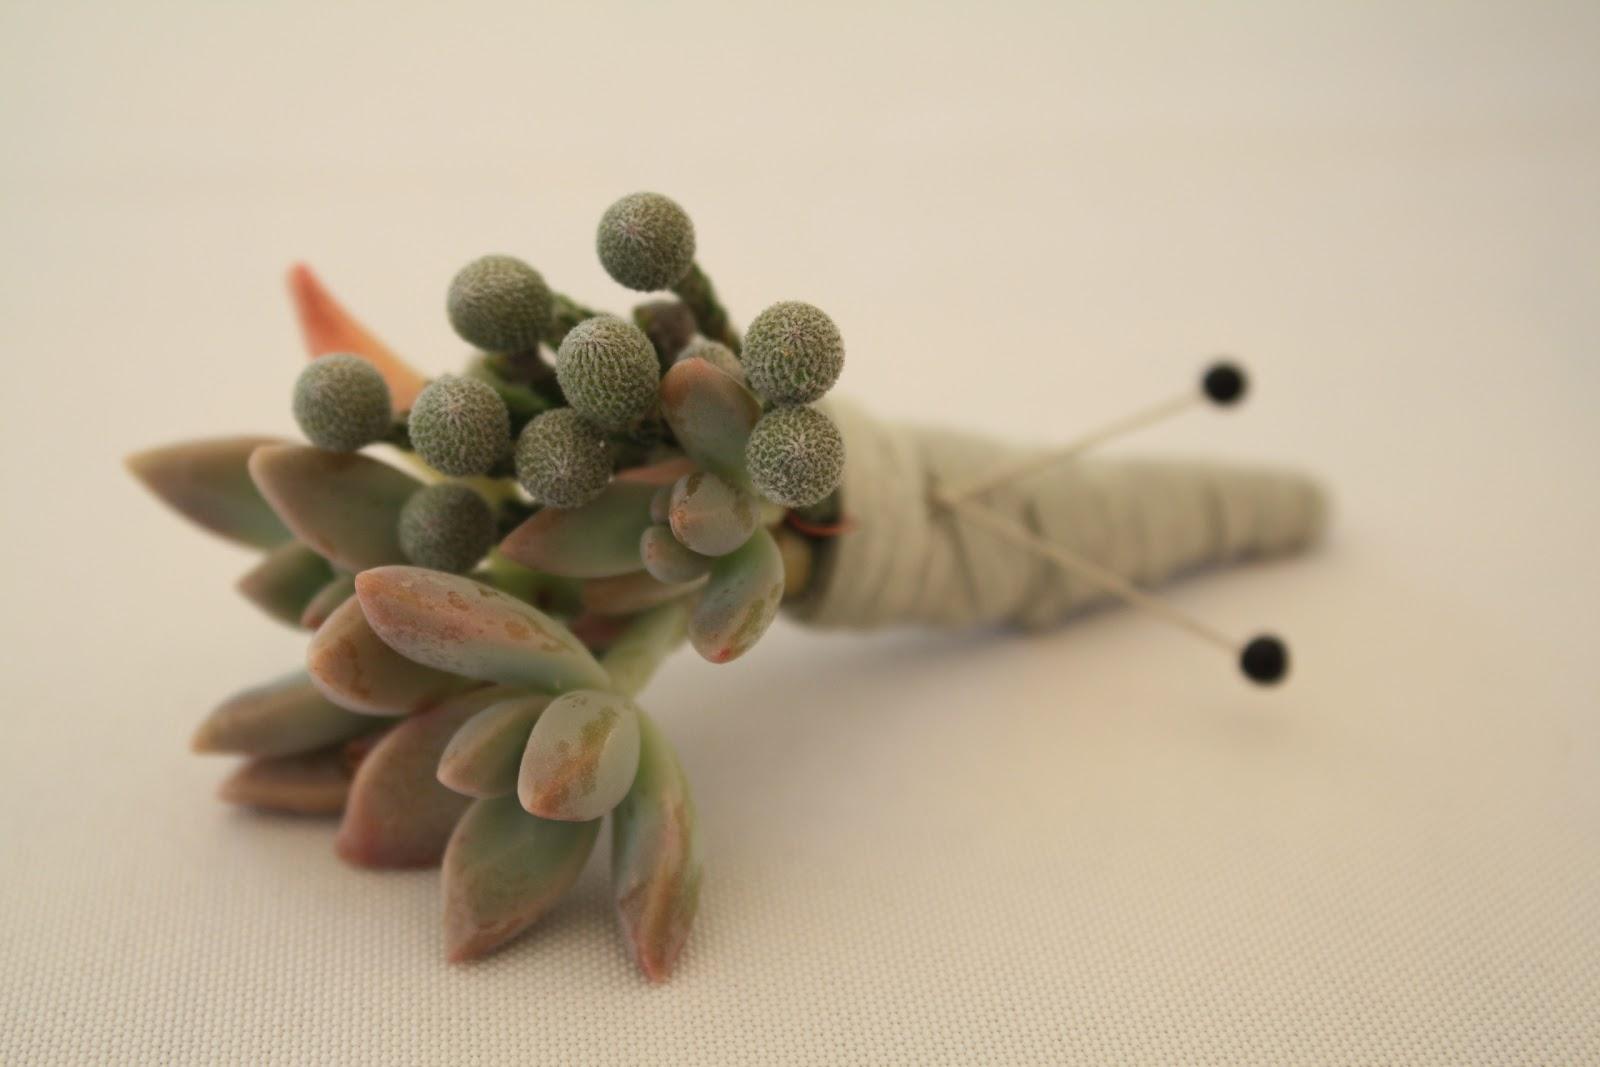 Succulent & Brunia Berries Boutonniere - Boutonnieres - Wedding Flowers - Groom - Usher - Best Man - Groomsmen - Ushers - Groom's Boutonniere